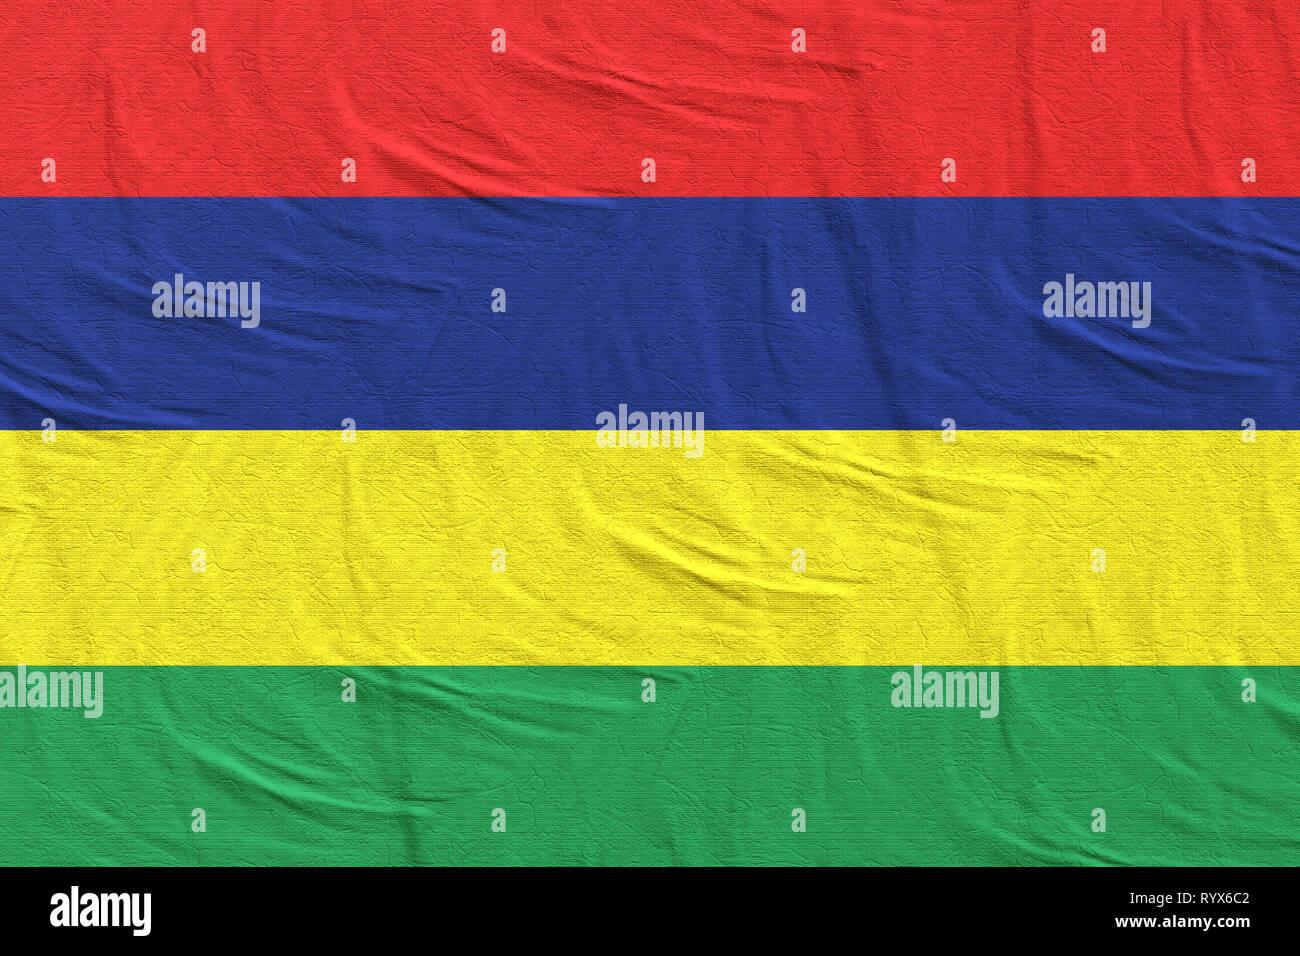 3d rendering of Republic of Mauritius flag - Stock Image